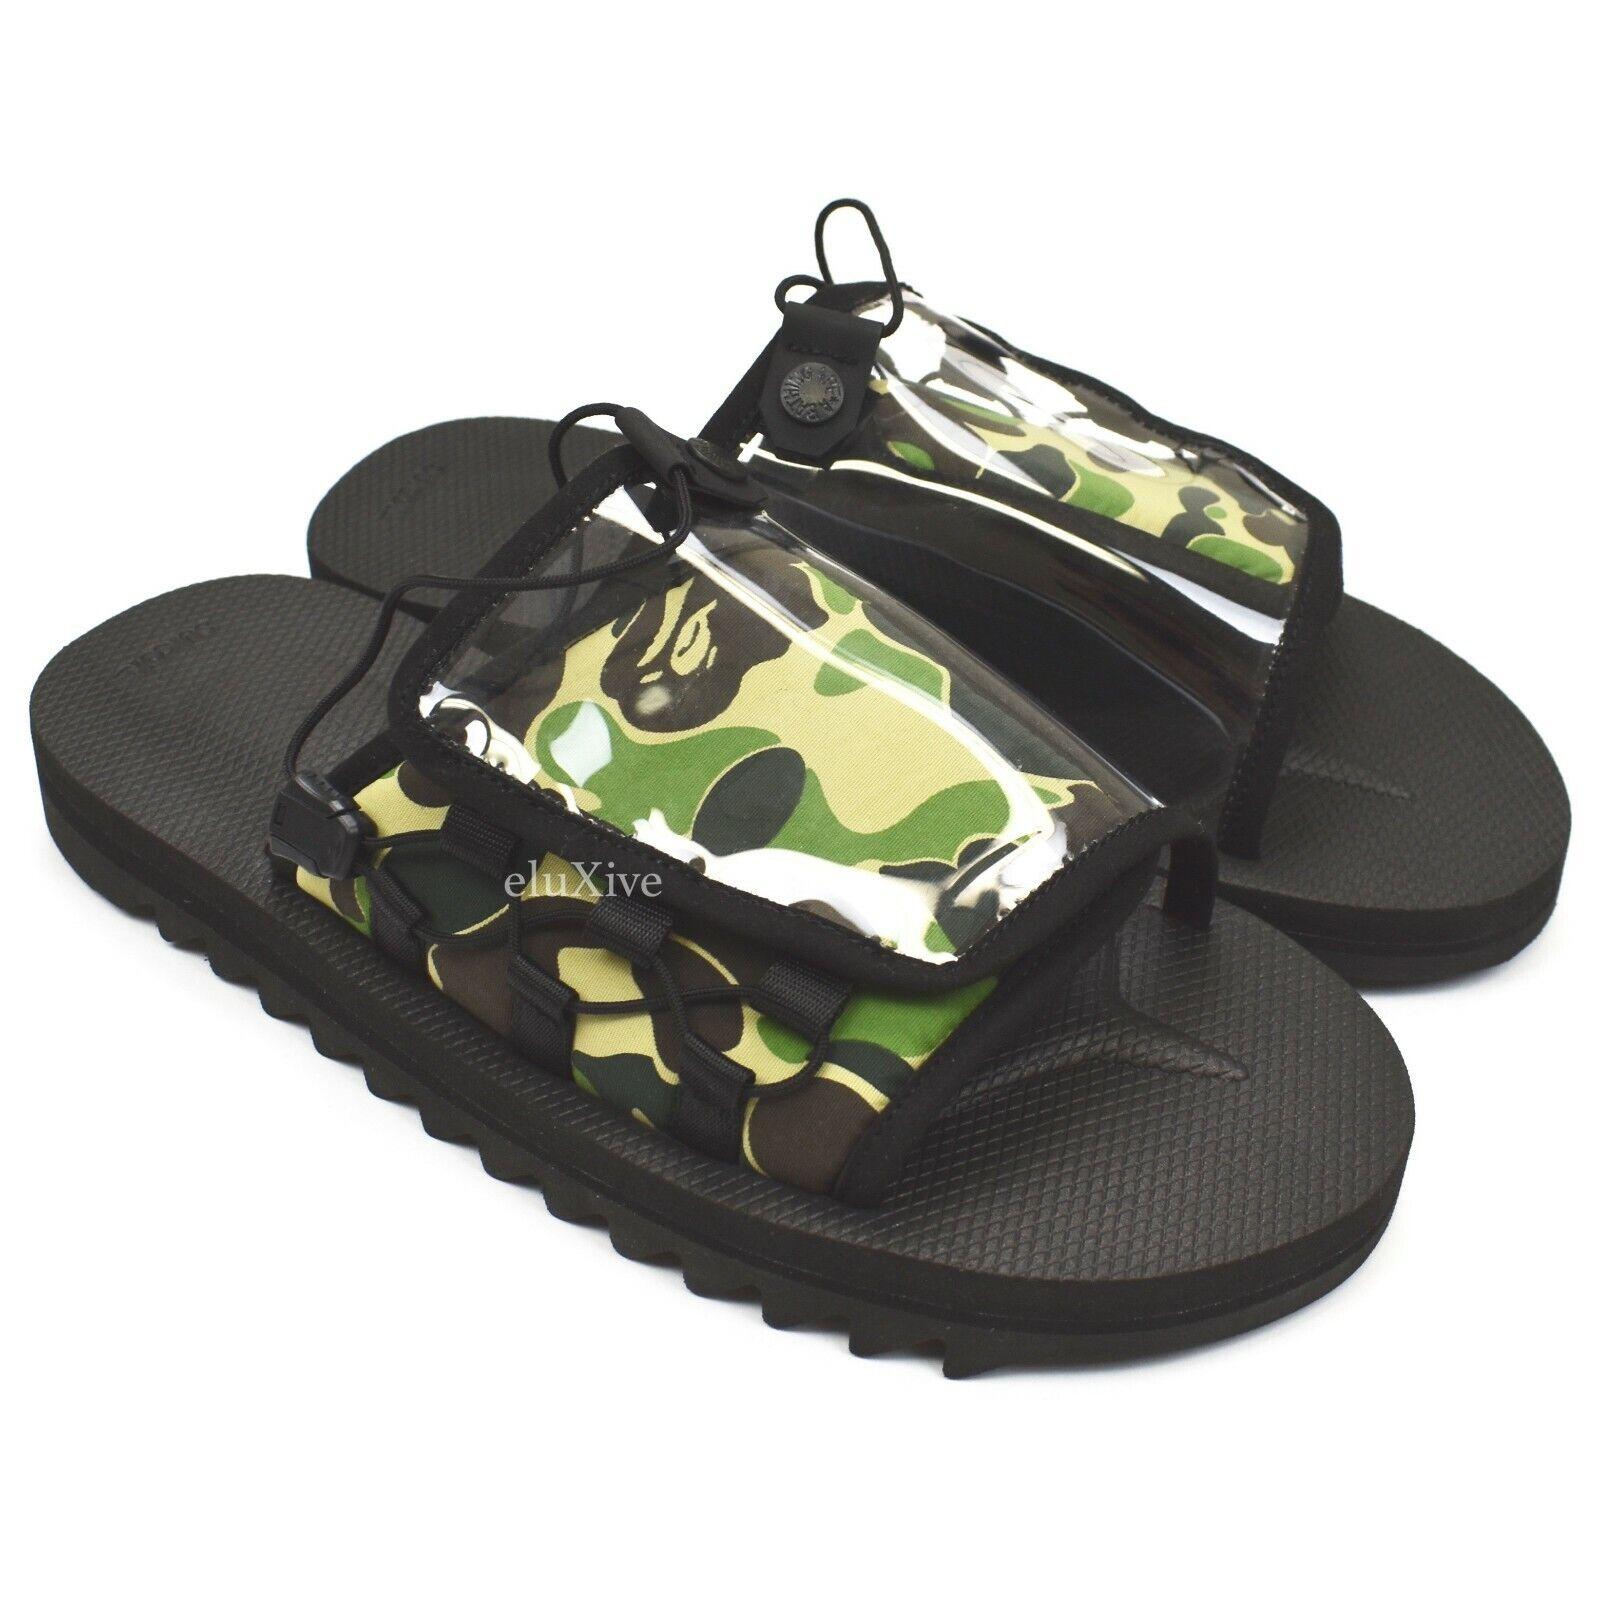 NWT A Bathing Ape Bape Suicoke Camo Logo Print OG-056 Sandals 9 SS19 AUTHENTIC